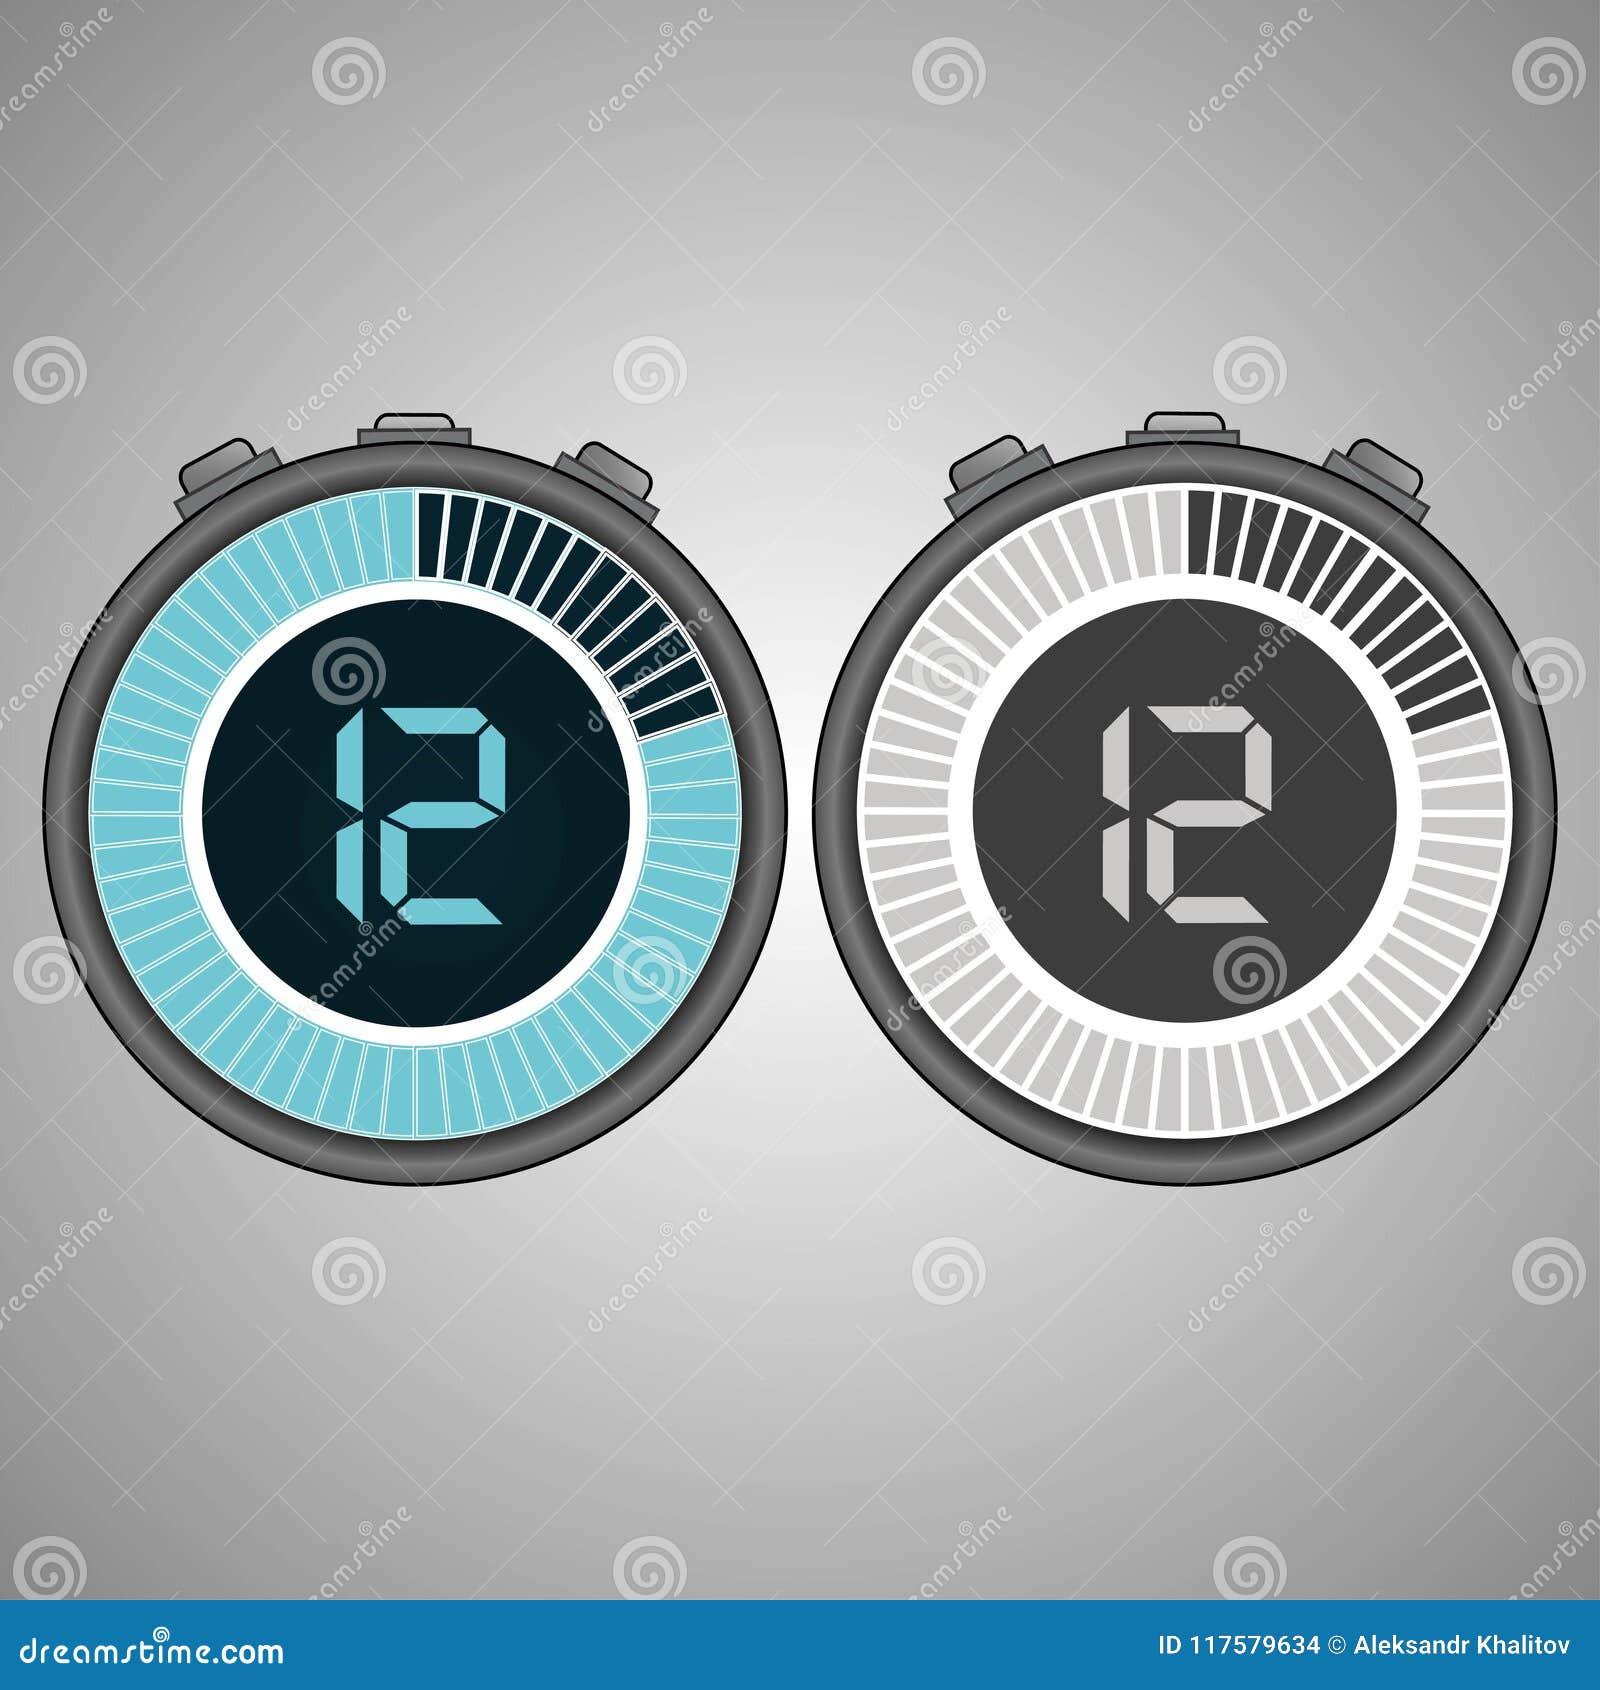 Electronic Digital Stopwatch 12 Seconds Stock Illustration Circuit Design